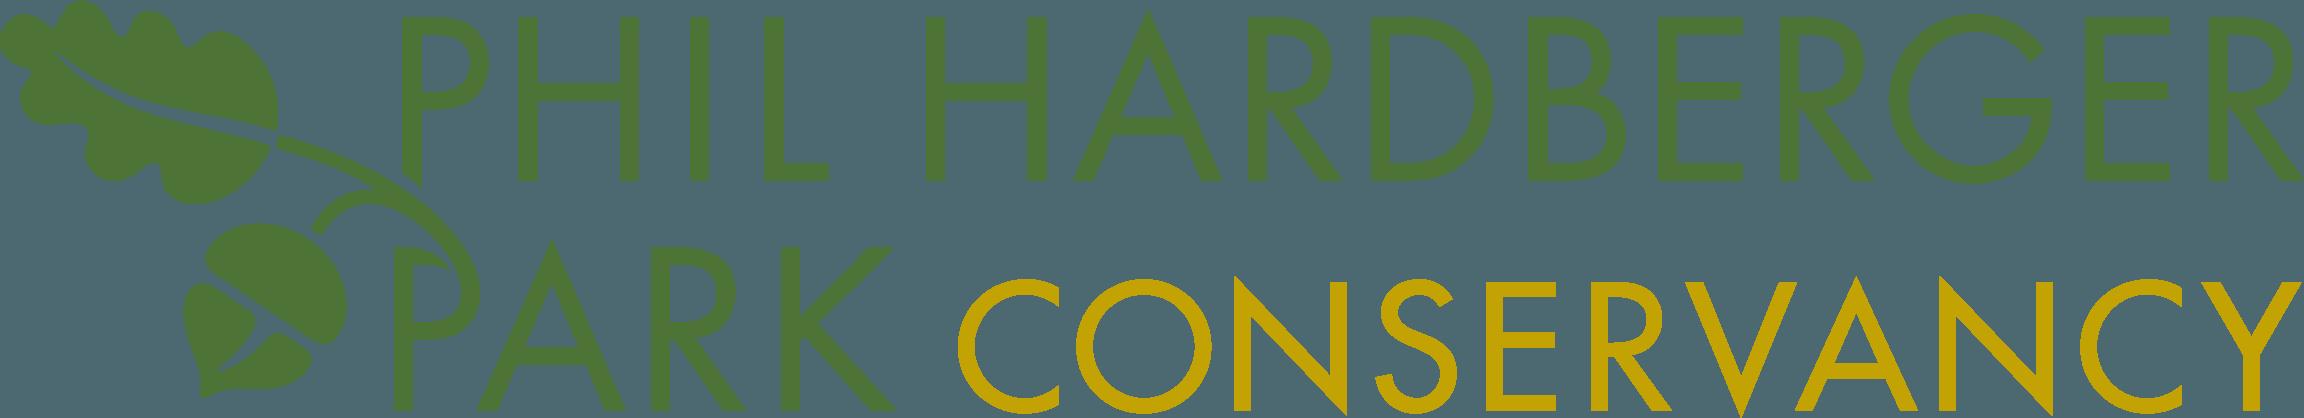 Phil Hardberger Park Conservancy